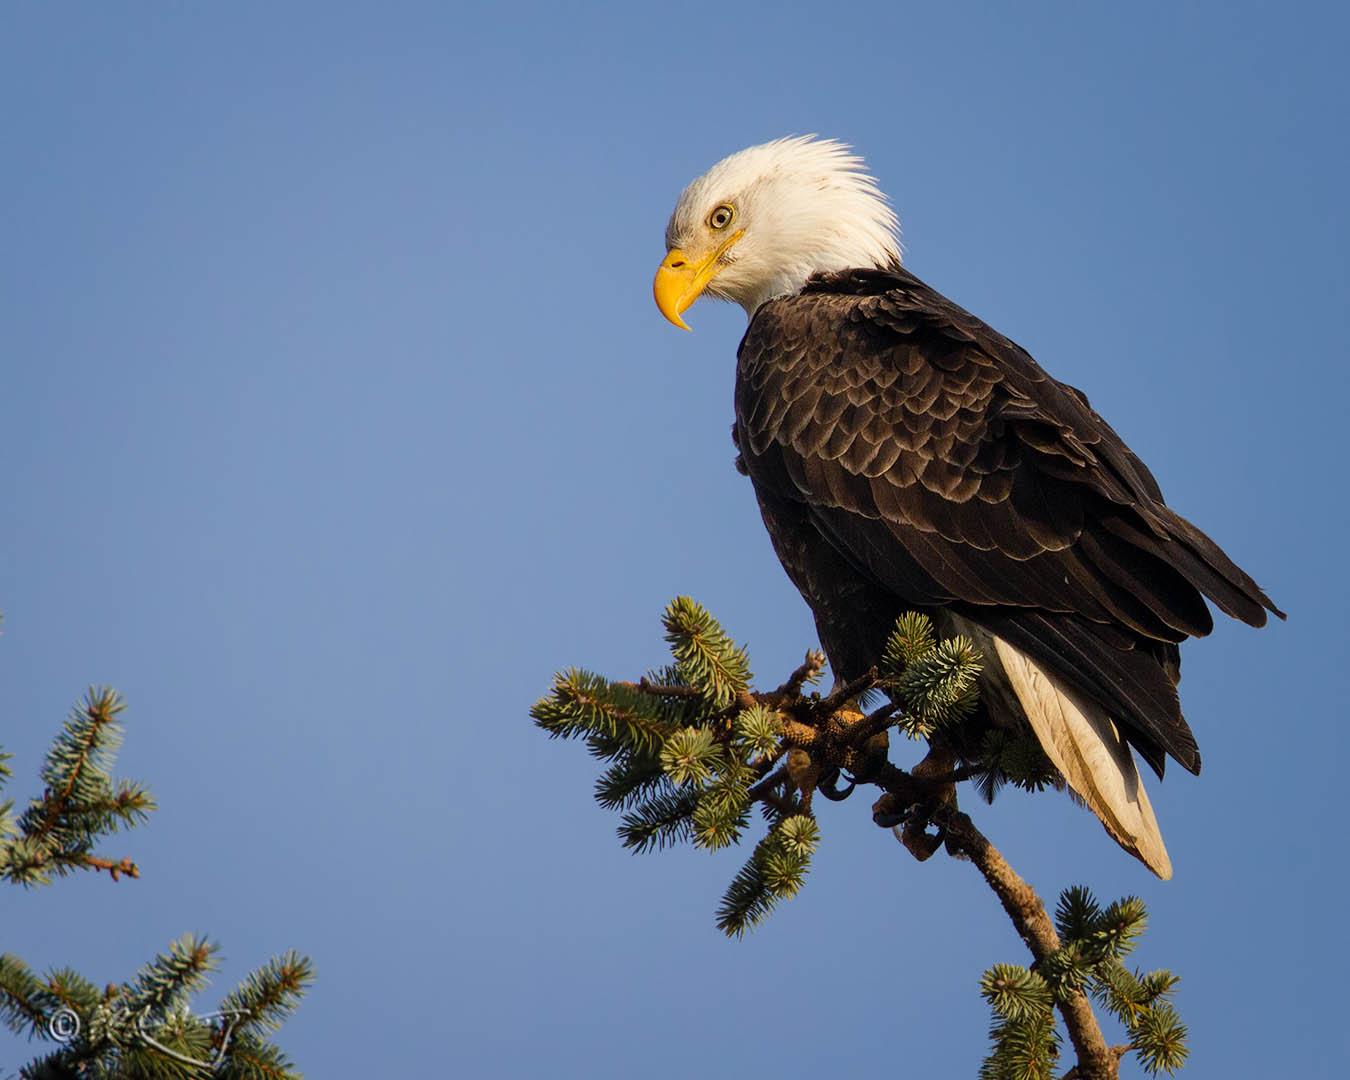 Bald_Eagle_perched